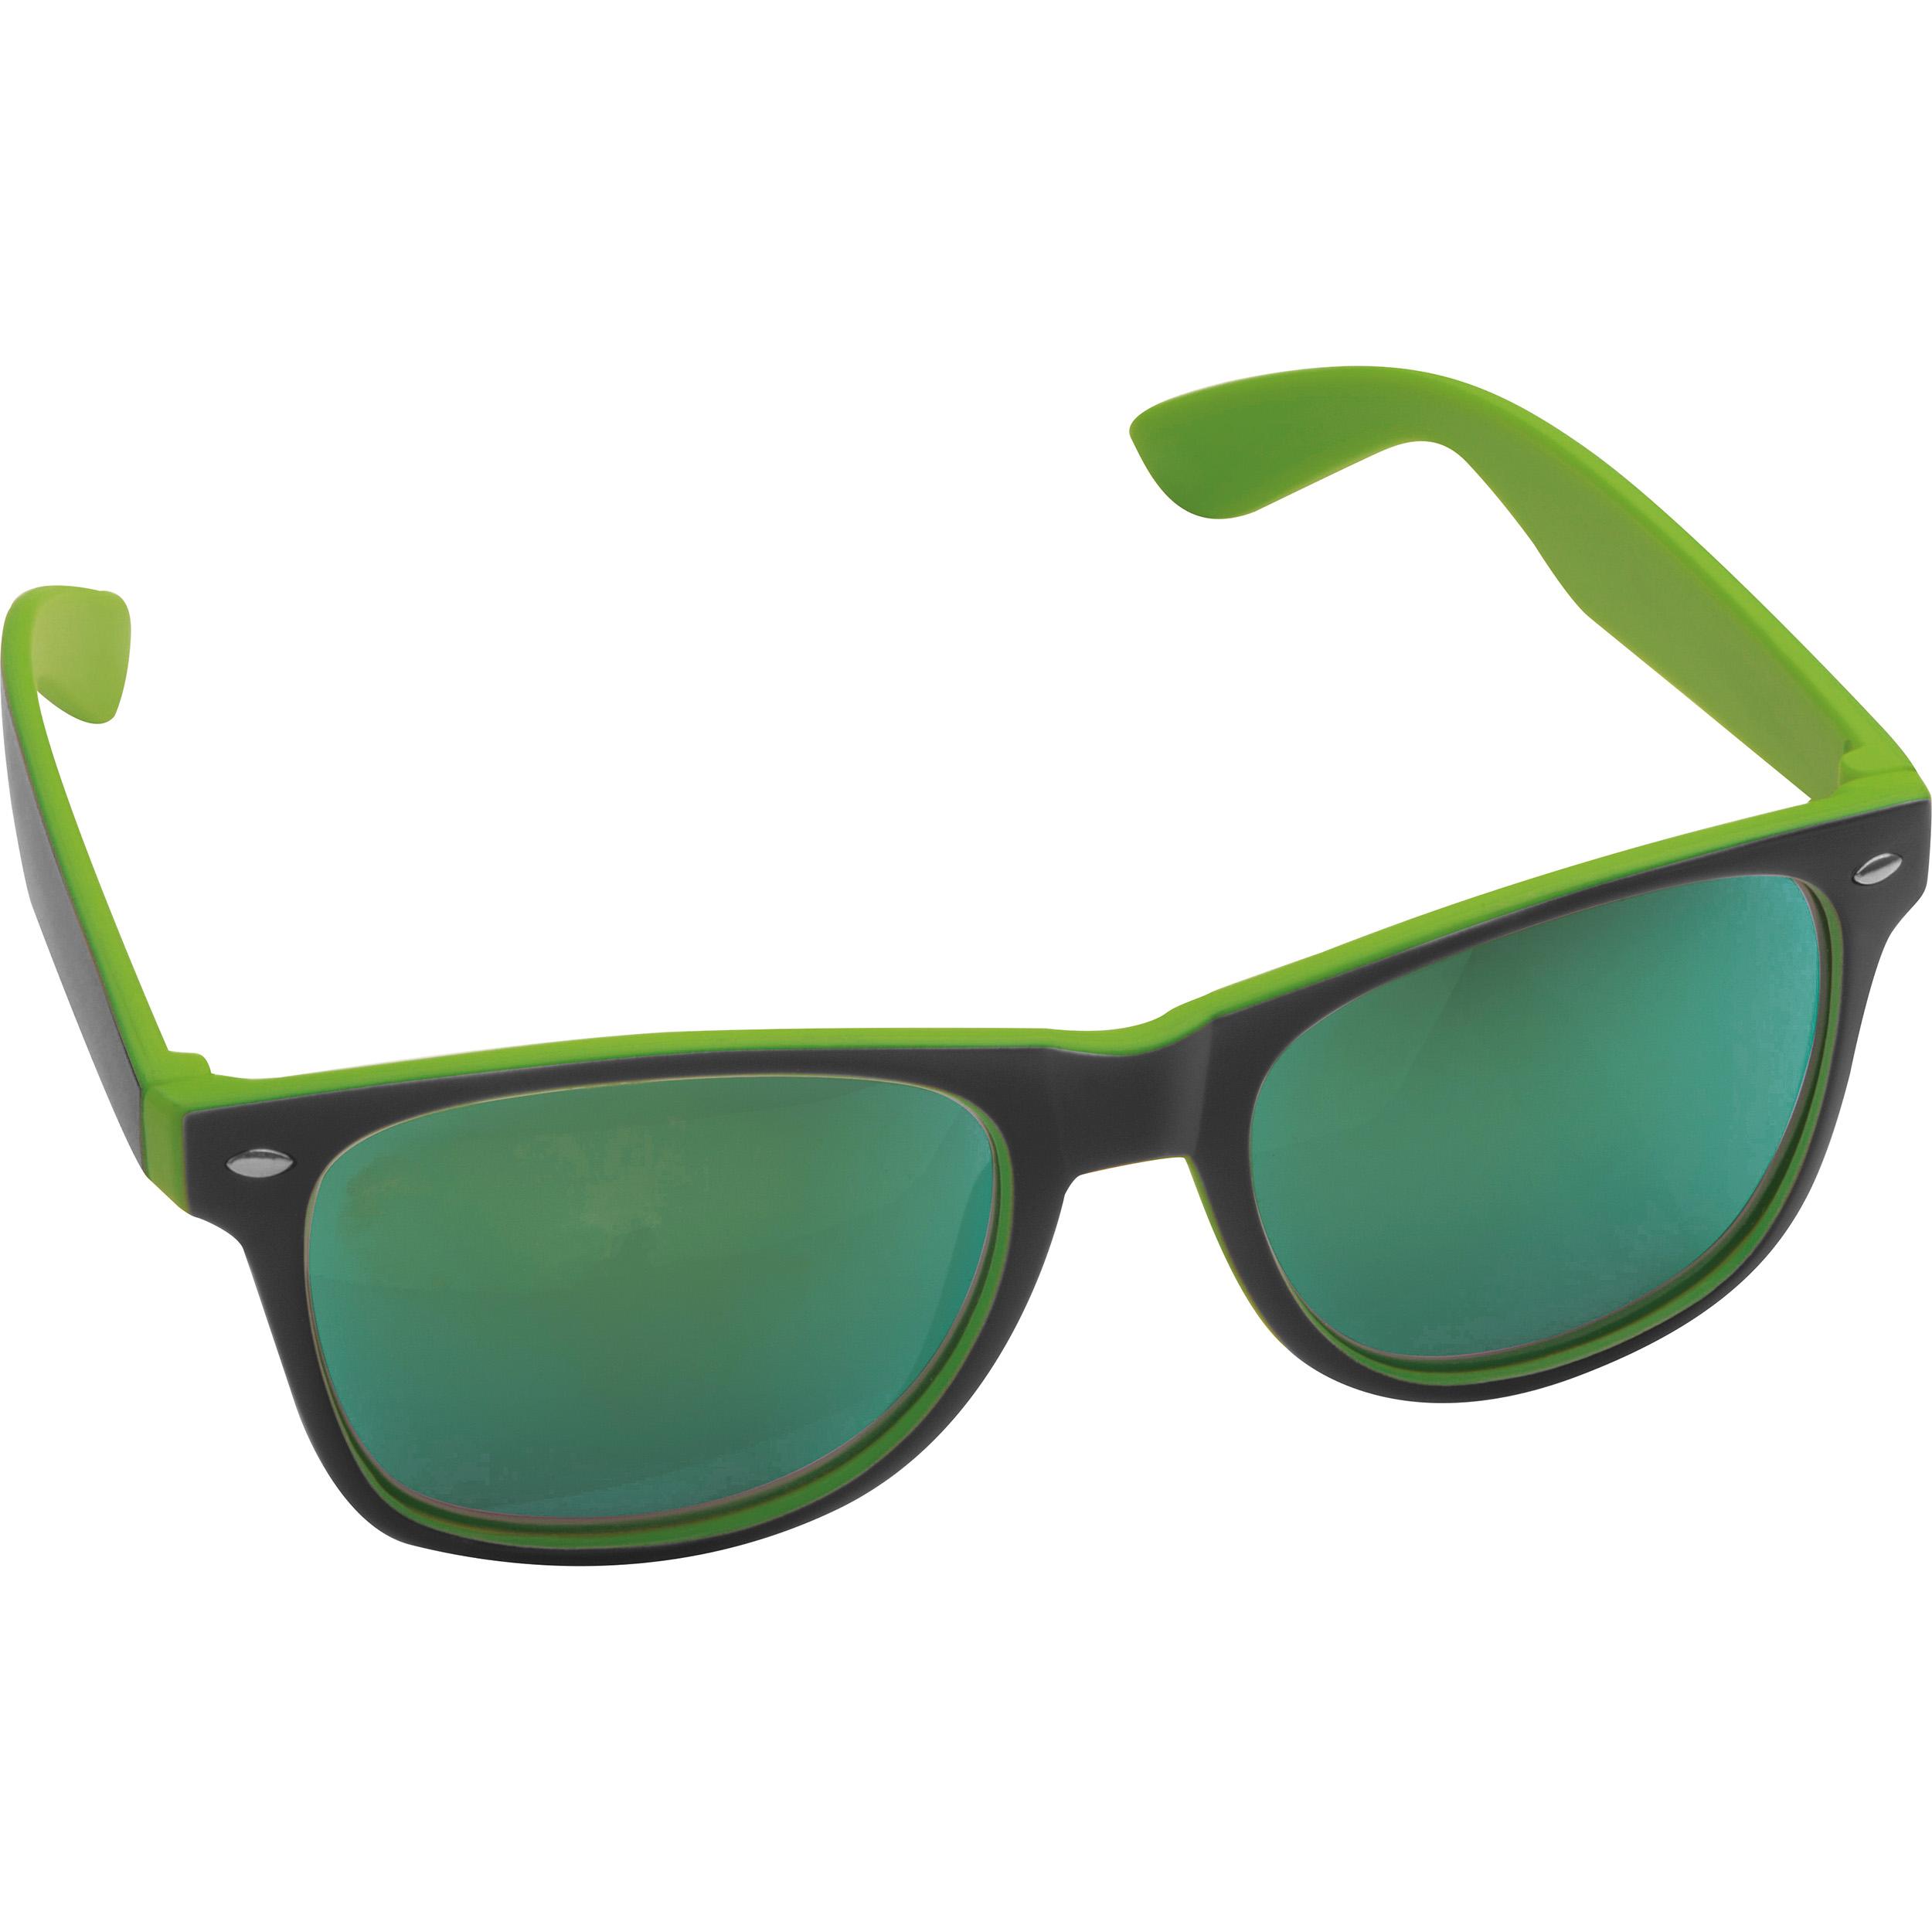 Bicoloured sunglasses with mirrored lenses